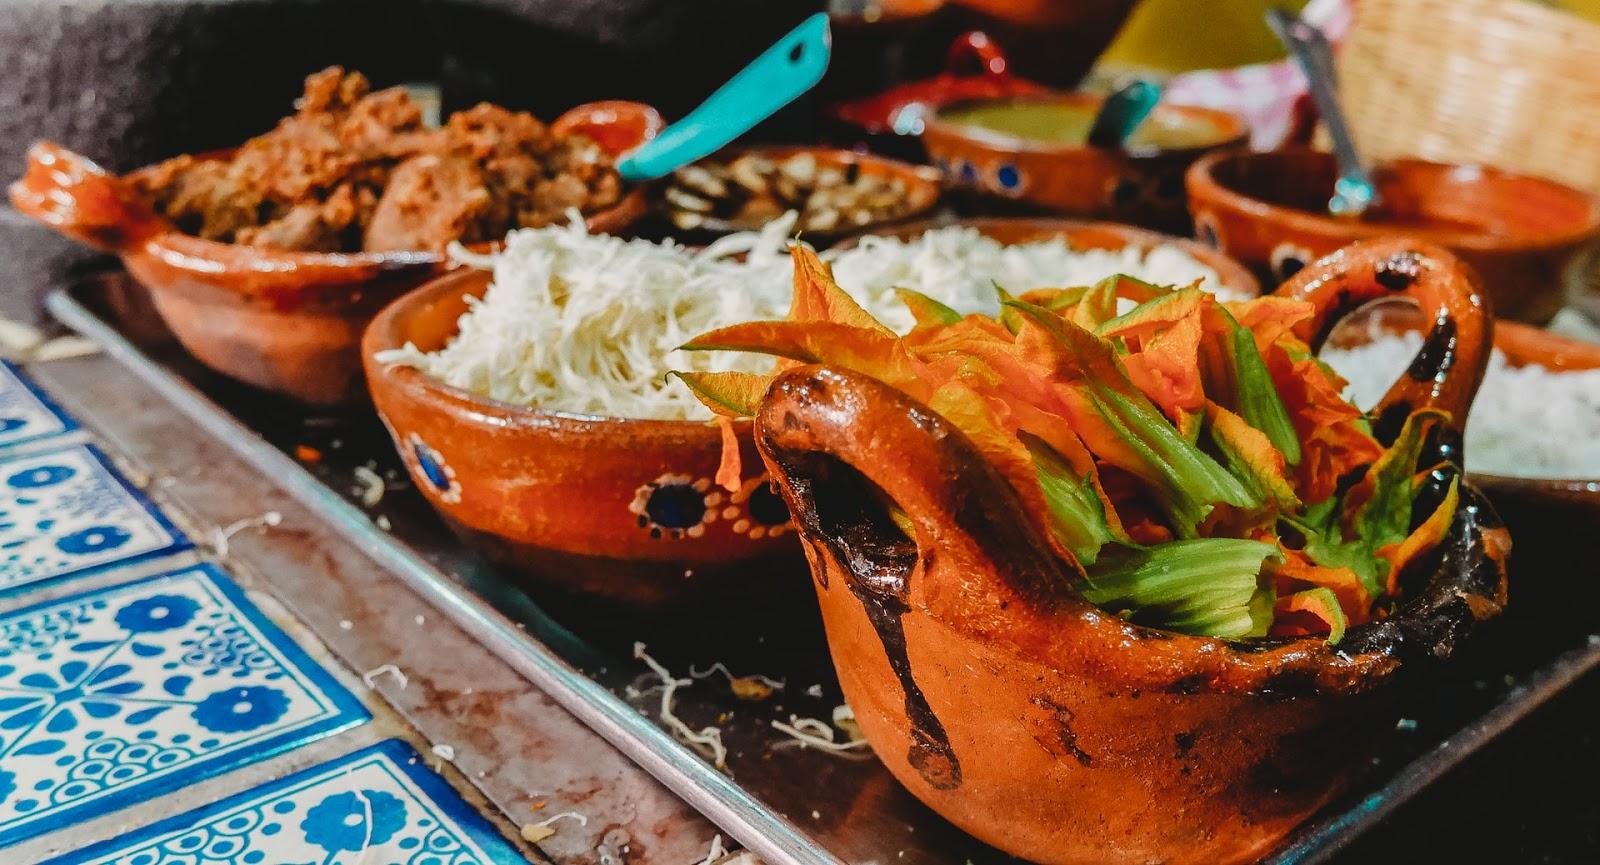 Top 7 Mexican Restaurants in Charlotte